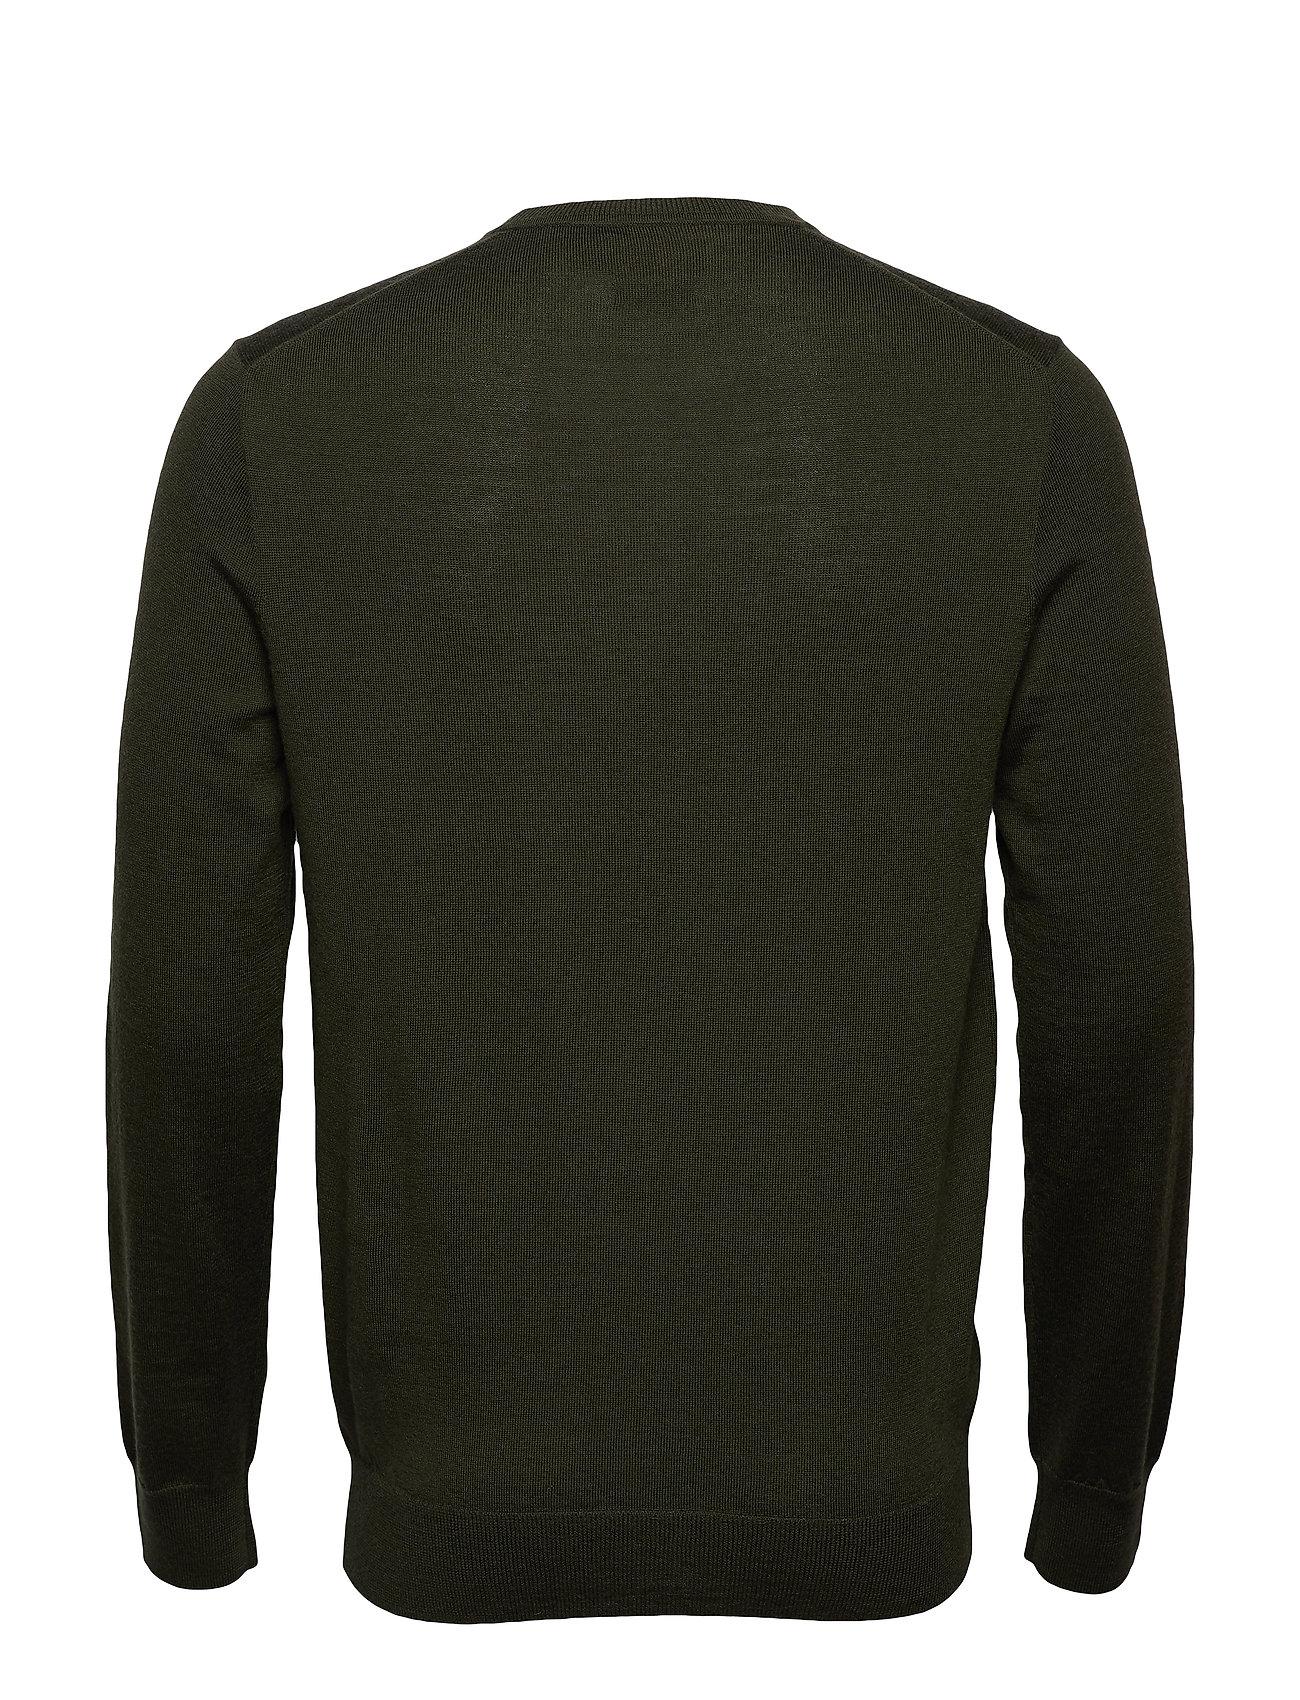 Cloth Lauren Ls Sf Cn sweateroil GreenPolo Ralph Pp long Sleeve mNwOyvP8n0